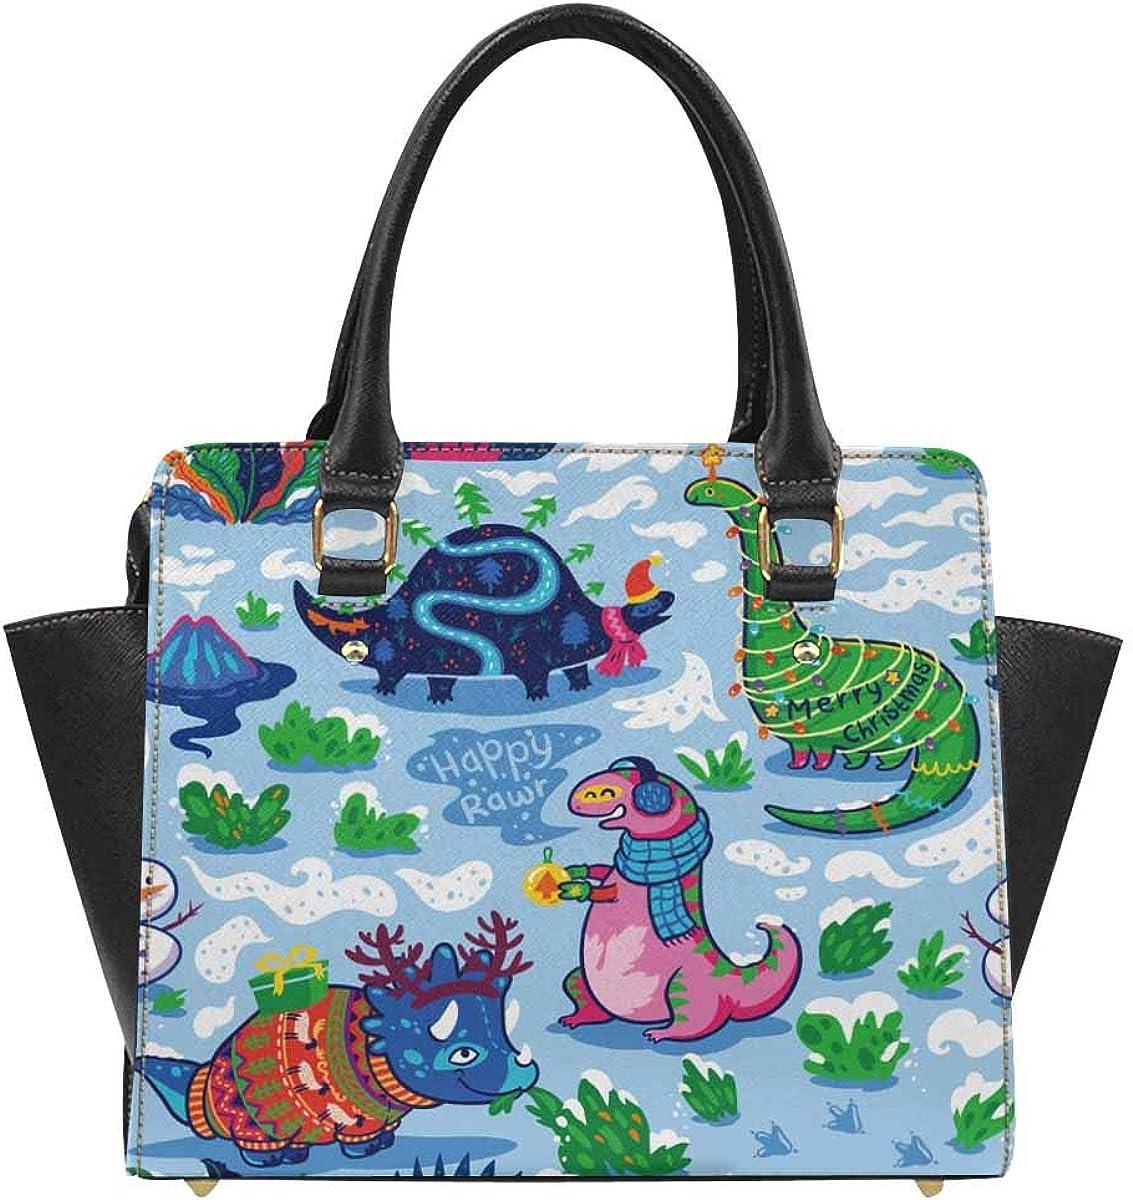 INTERESTPRINT Cute Cartoon Dolphin and Beluga Crossbody Satchel Bag Tote Shoulder Handbags